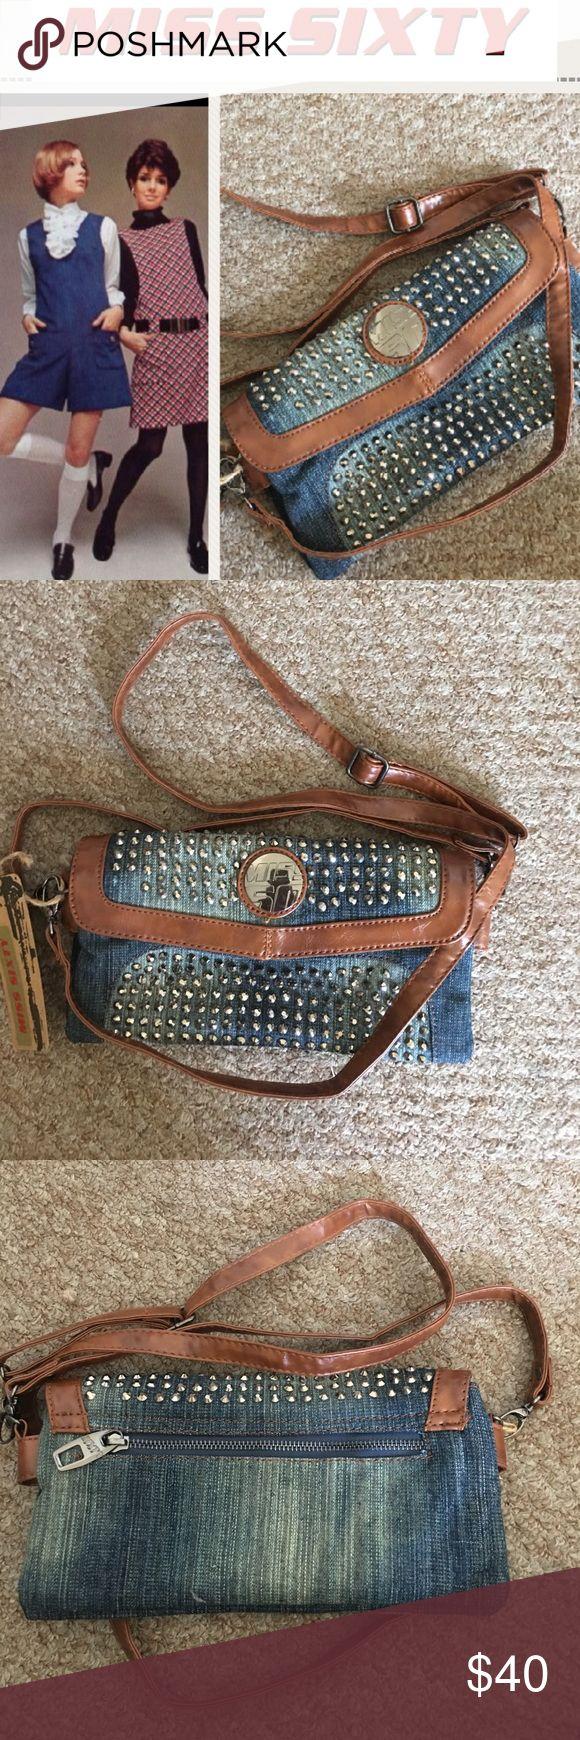 Miss Sixty rare denim studded purse Rare and beautiful Miss Sixty denim studded crossbody bag brand NWT hard to find. Miss Sixty Bags Crossbody Bags